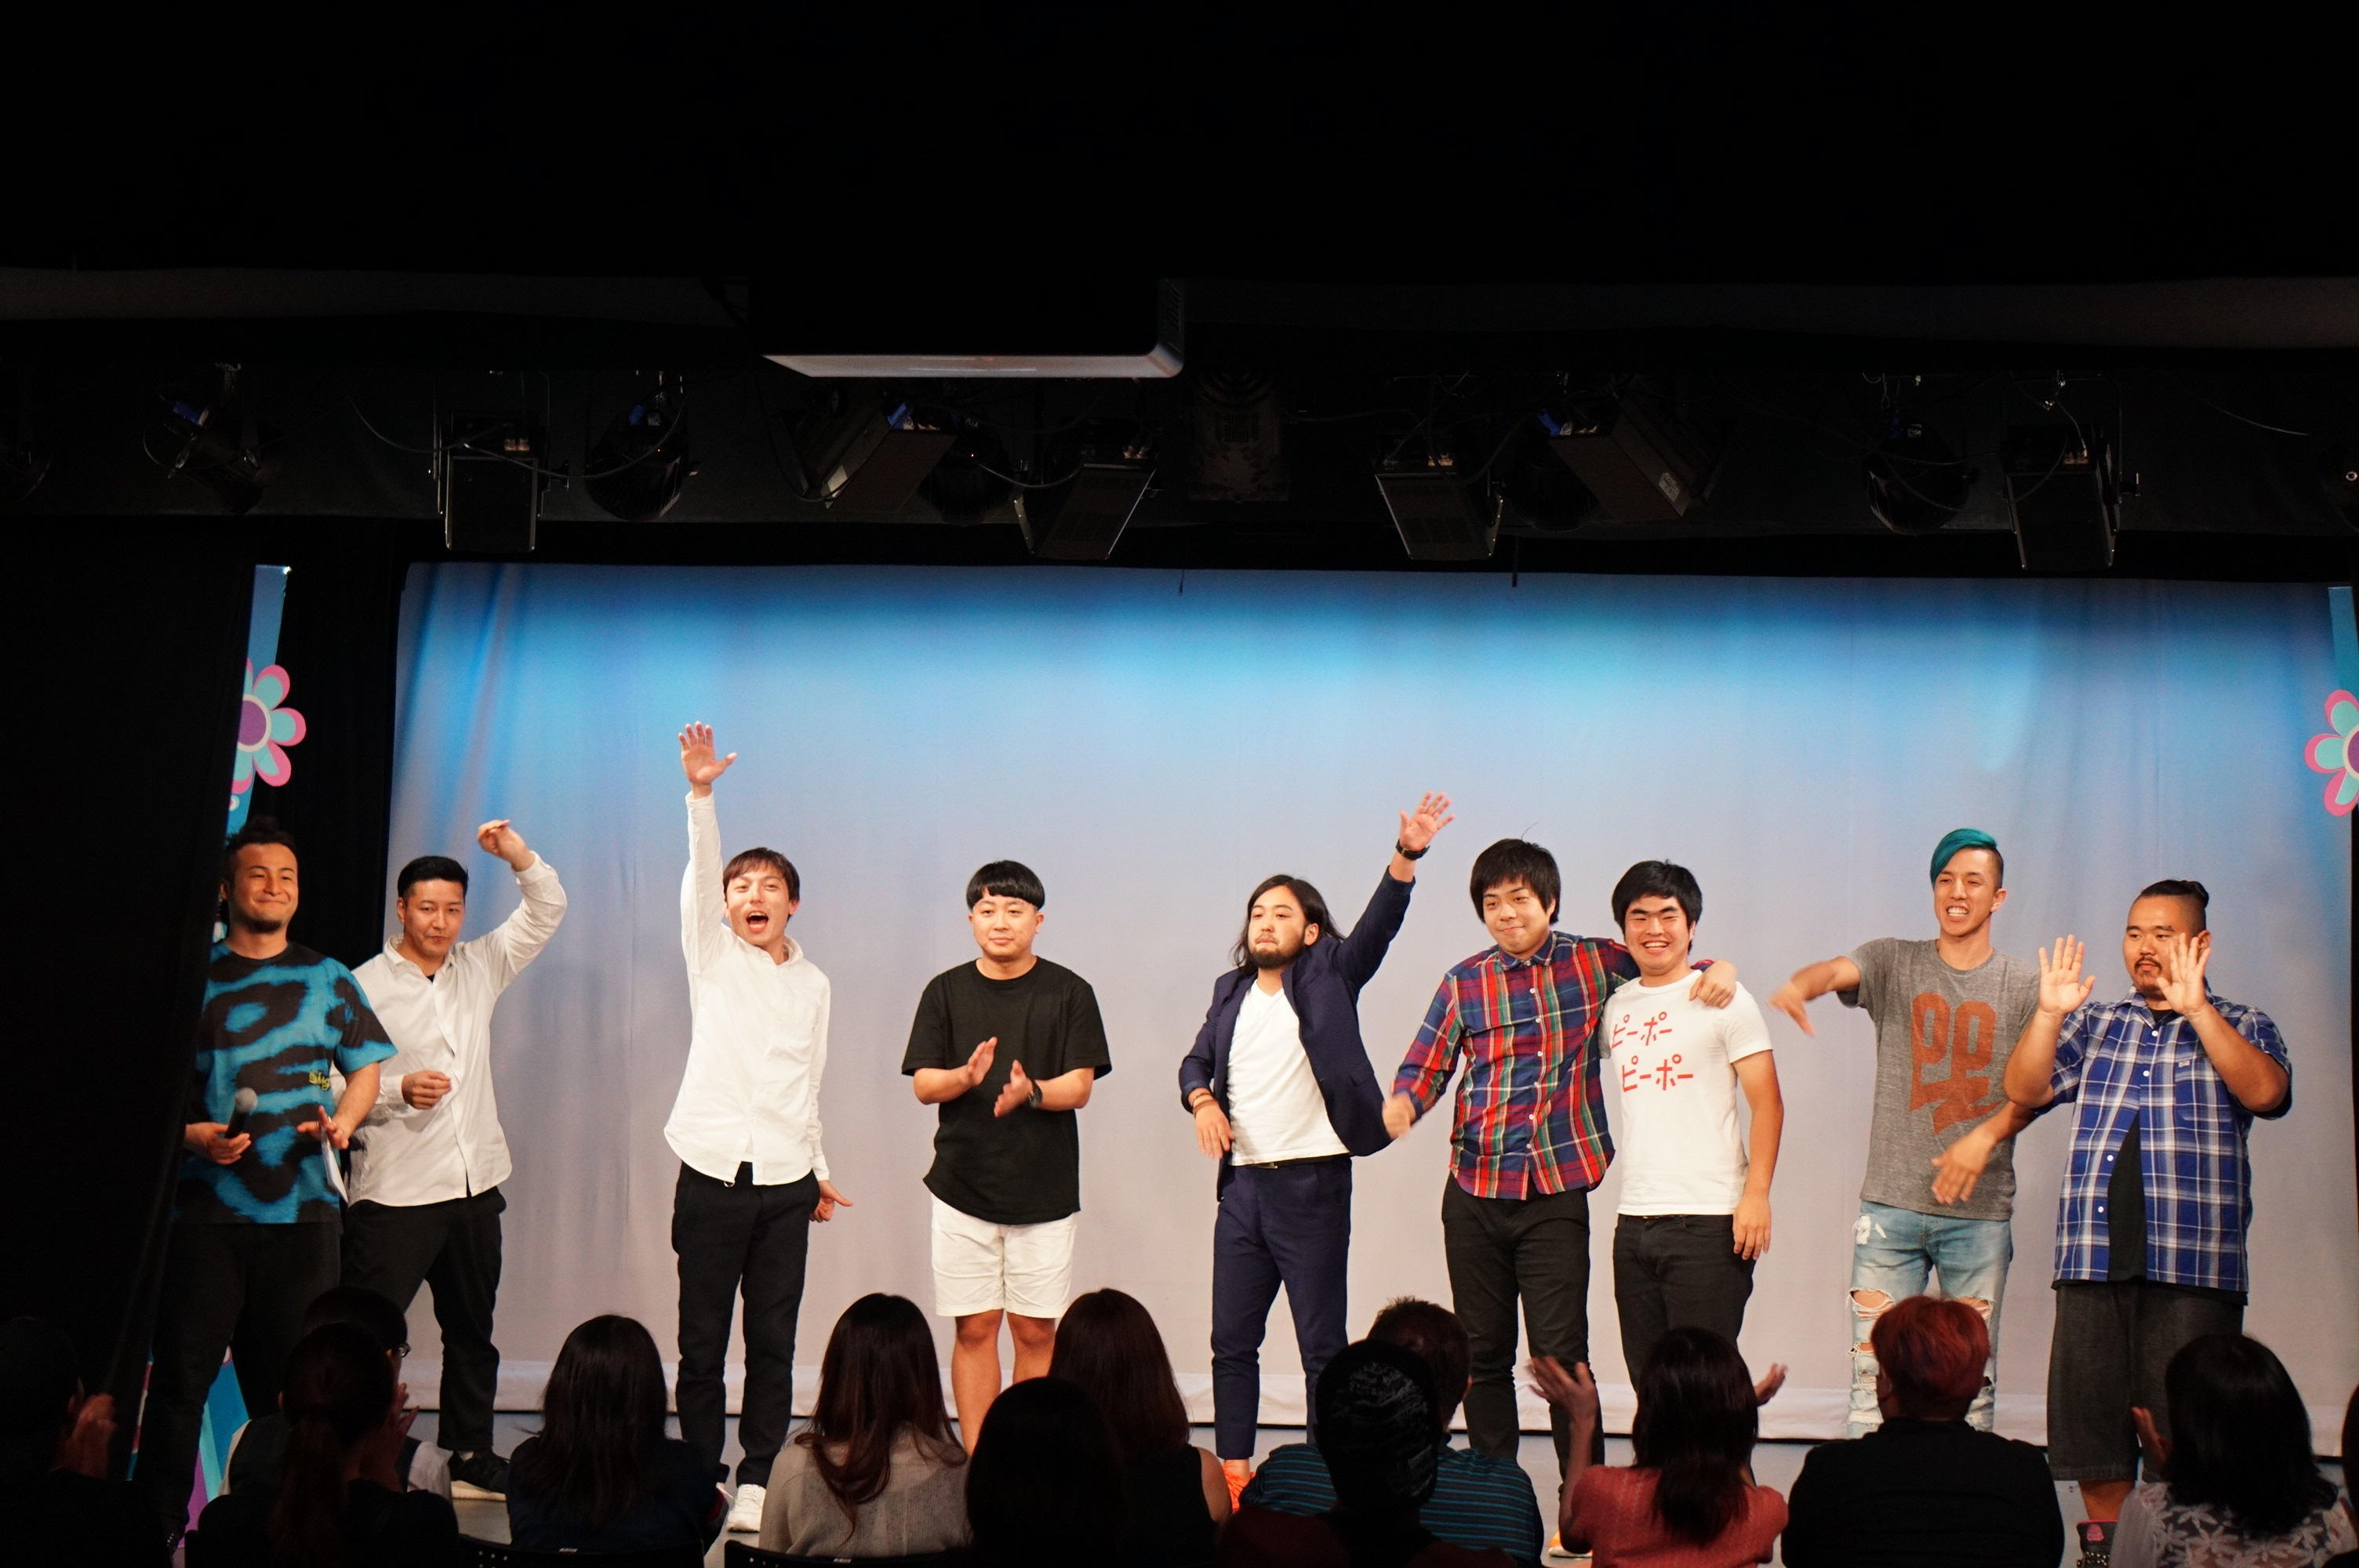 http://news.yoshimoto.co.jp/20160526180955-a68ae5bc0333c1e5f3cec73861b8ee390ee91ce3.jpg